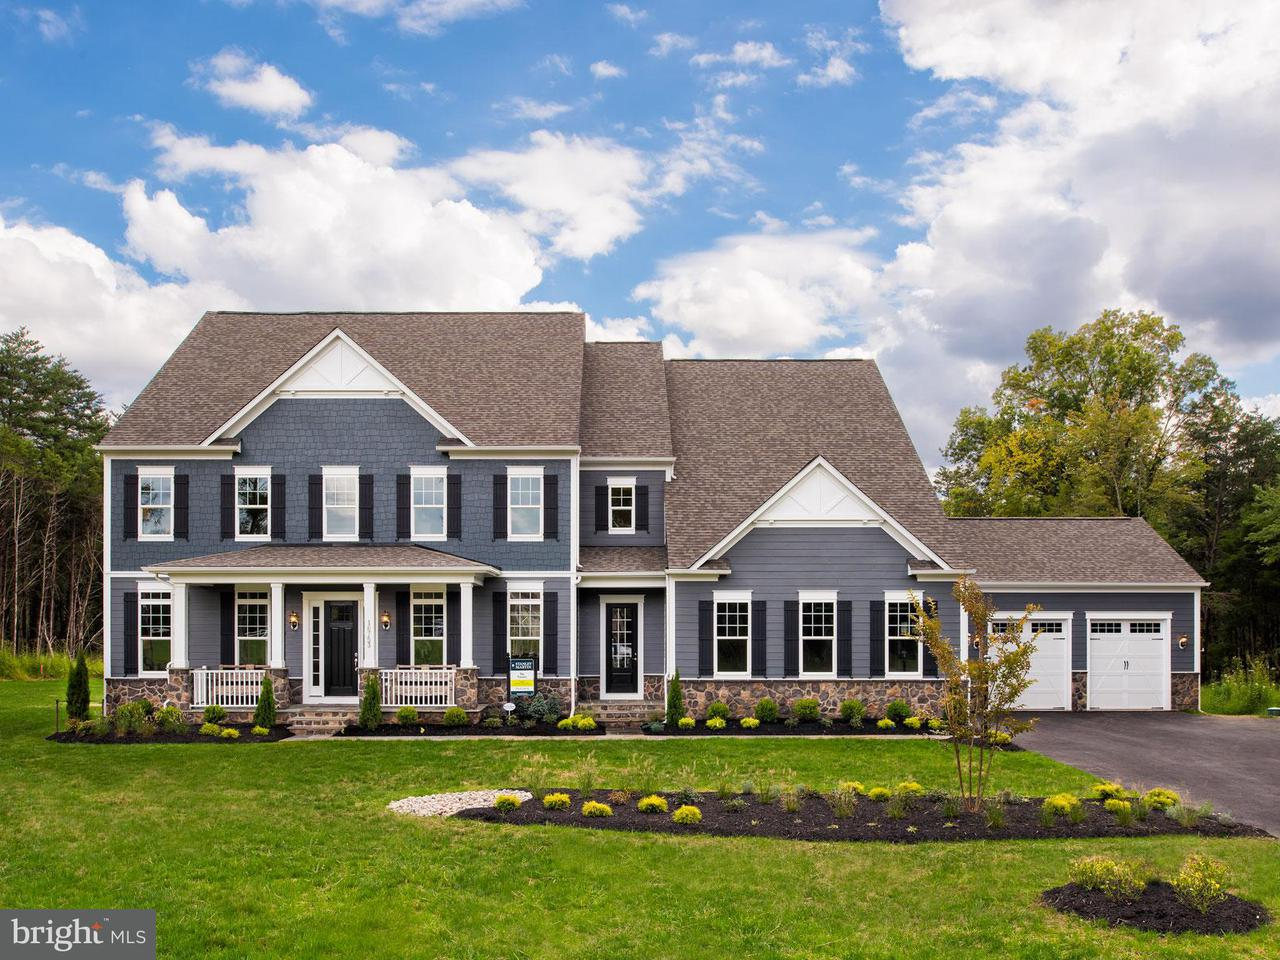 獨棟家庭住宅 為 出售 在 16753 LORD SUDLEY Drive 16753 LORD SUDLEY Drive Centreville, 弗吉尼亞州 20120 美國